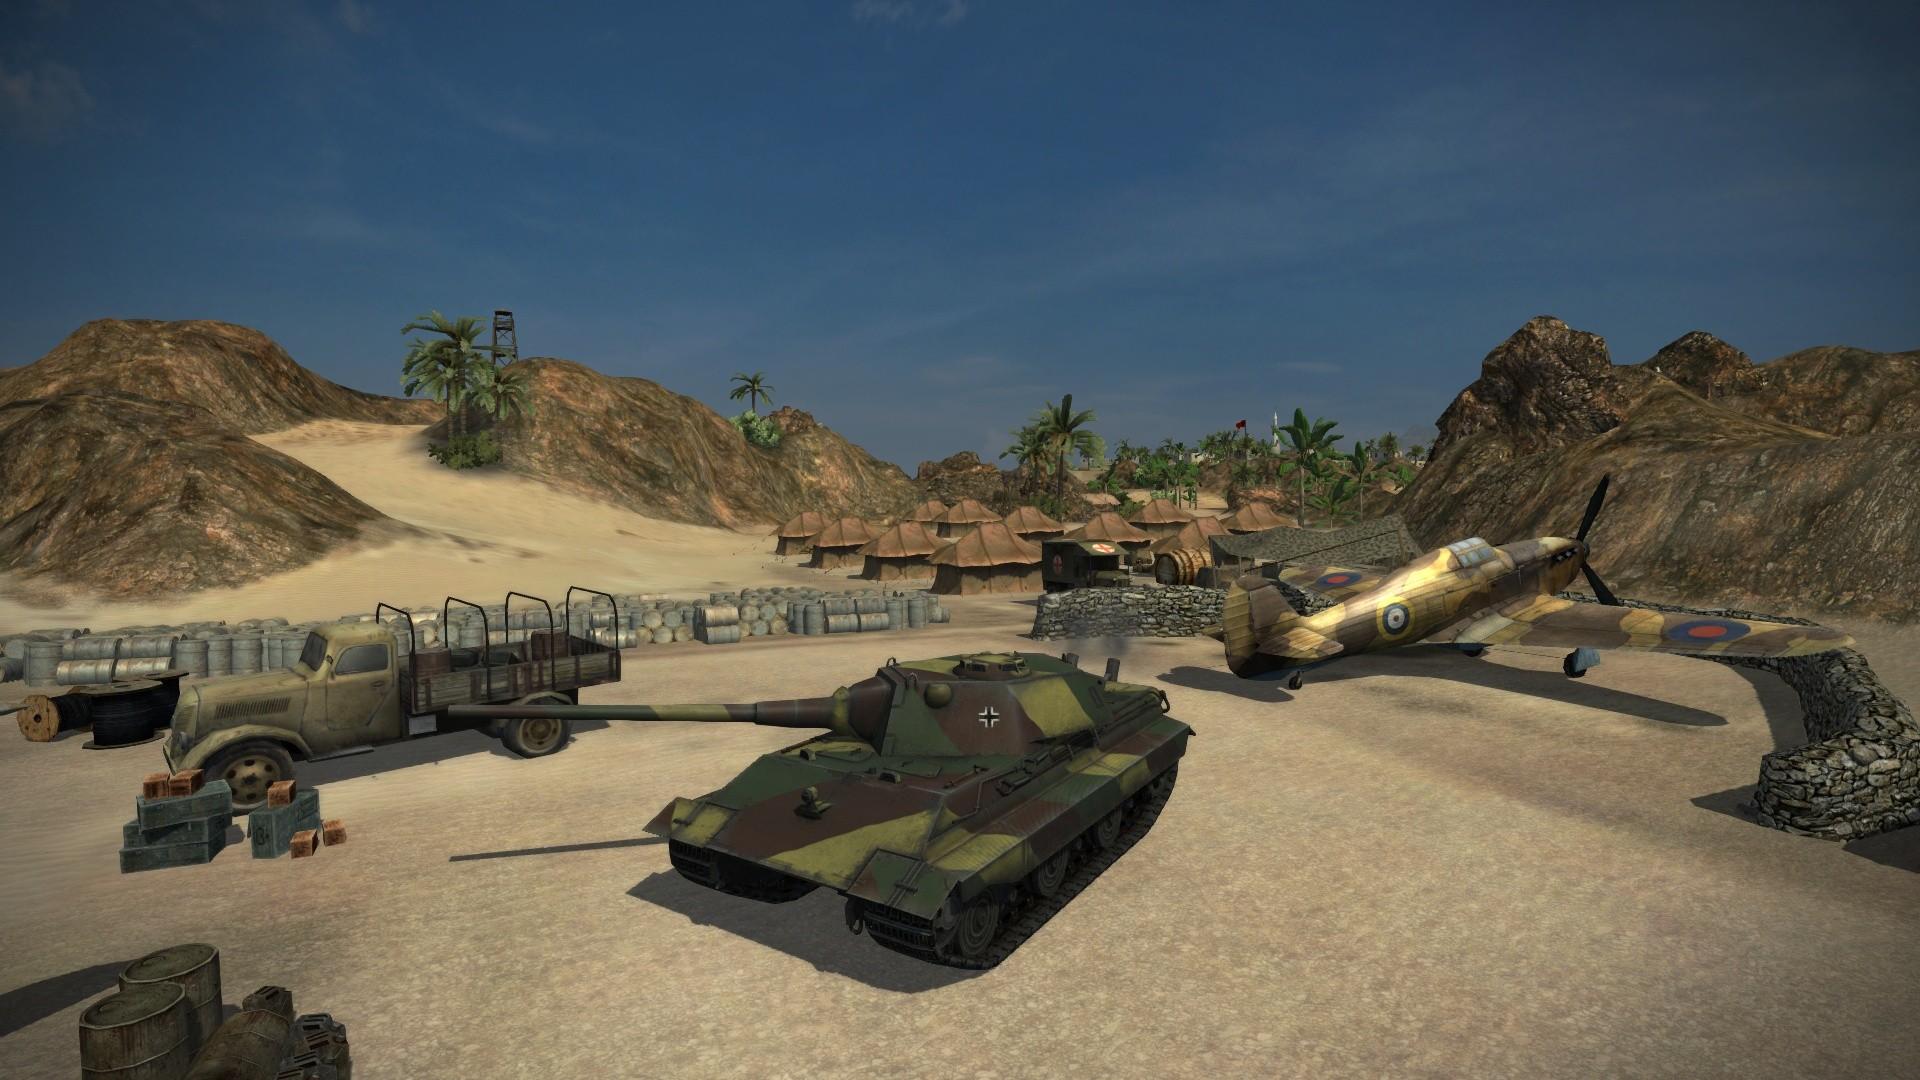 M - средний танк, характеристика, описание, как играть на е50м и обзор e 50m wot, гайд, секреты среднего танка e 50